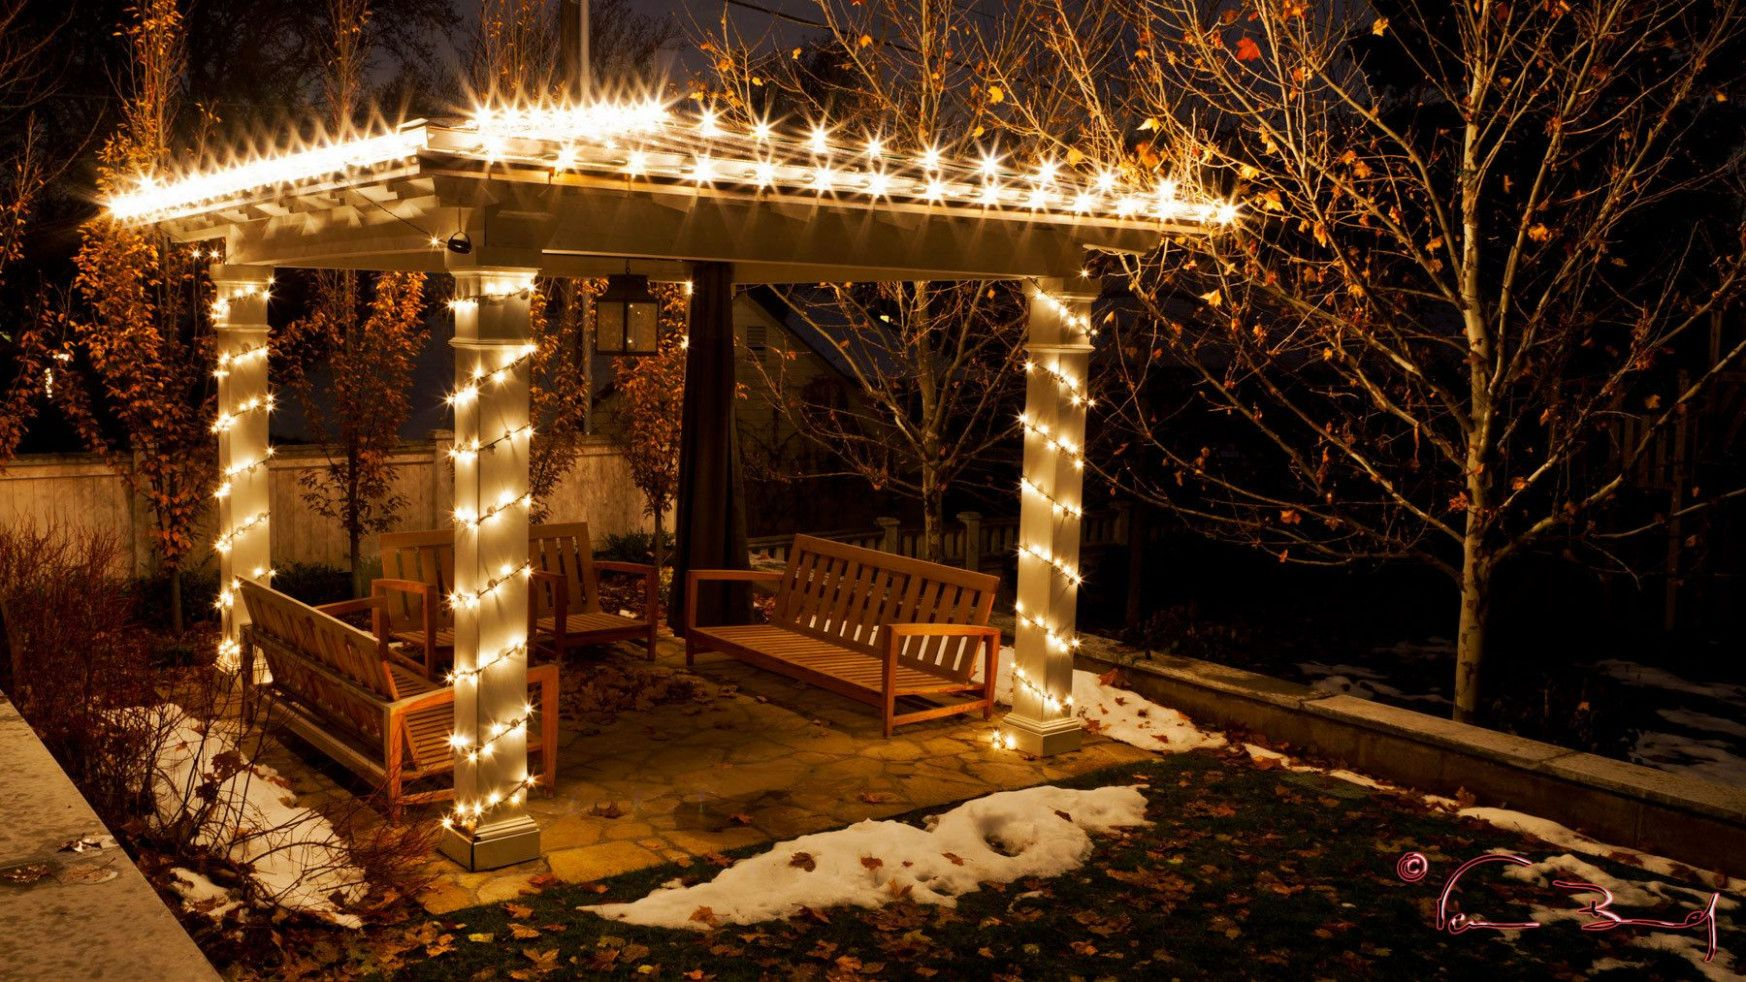 Outdoor Wedding Gazebo Fairy Lights Outdoor Wedding Gazebo Gazebo Lighting Gazebo Wedding